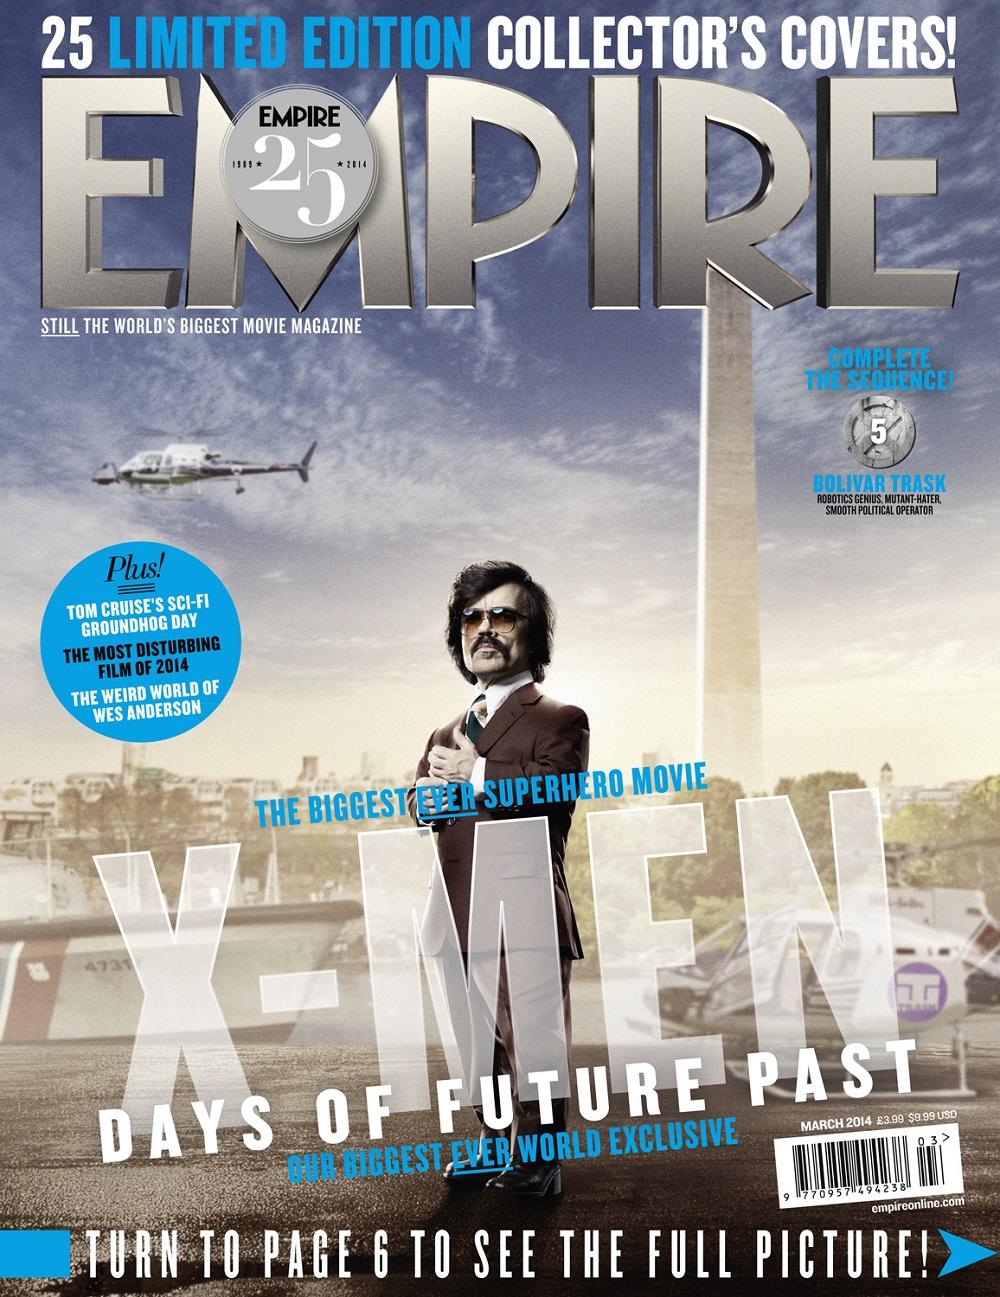 x-men-days-of-future-past-empire-cover-trask